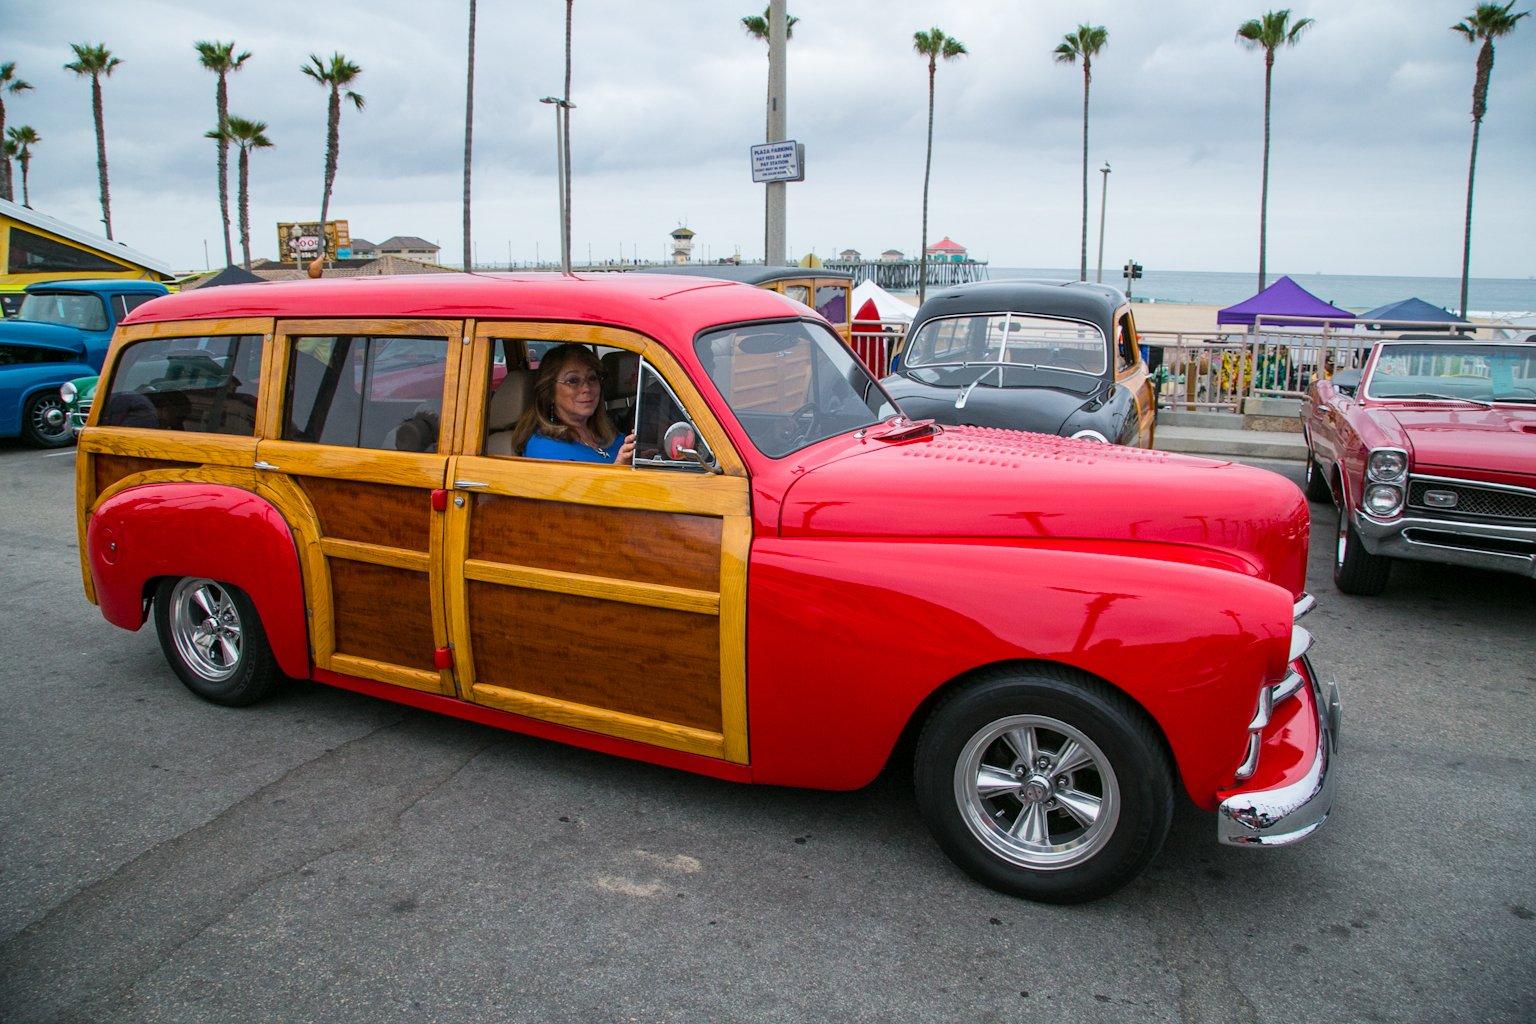 BangShiftcom Woodies Every Woody At The Beachcruiser Car Show At - Car show huntington beach